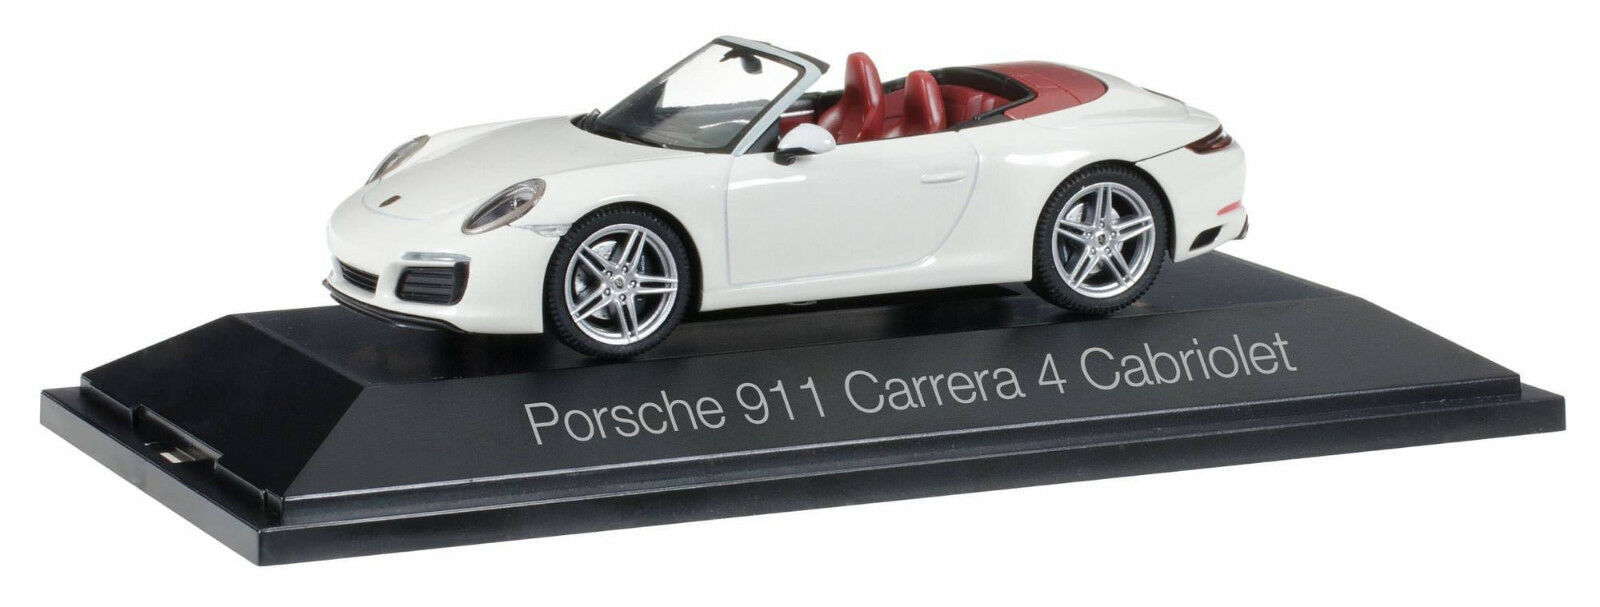 Herpa 071116 Porsche 911 Carrera 4 Cabrio dans carreraweissmetallic 1 43 NOUVEAU & NEUF dans sa boîte